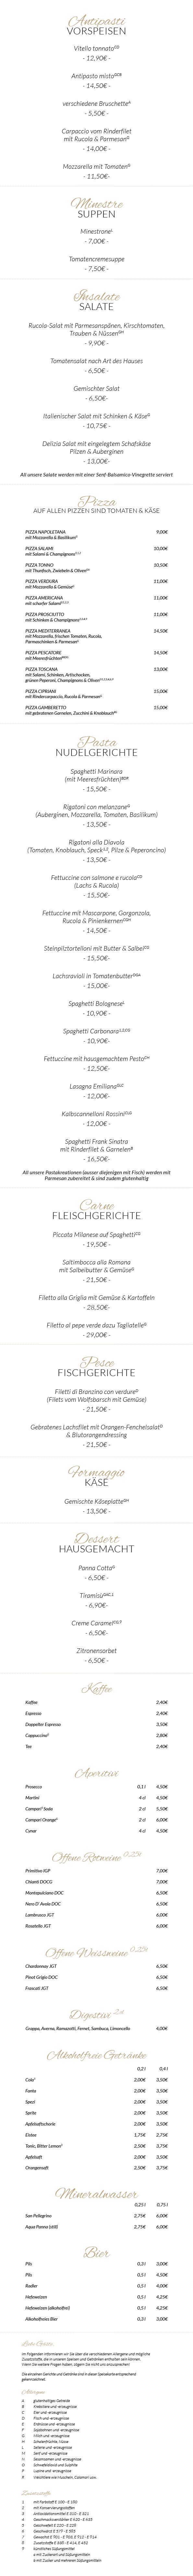 Trattoria-Toscana-Heidelberg-Speisekarte